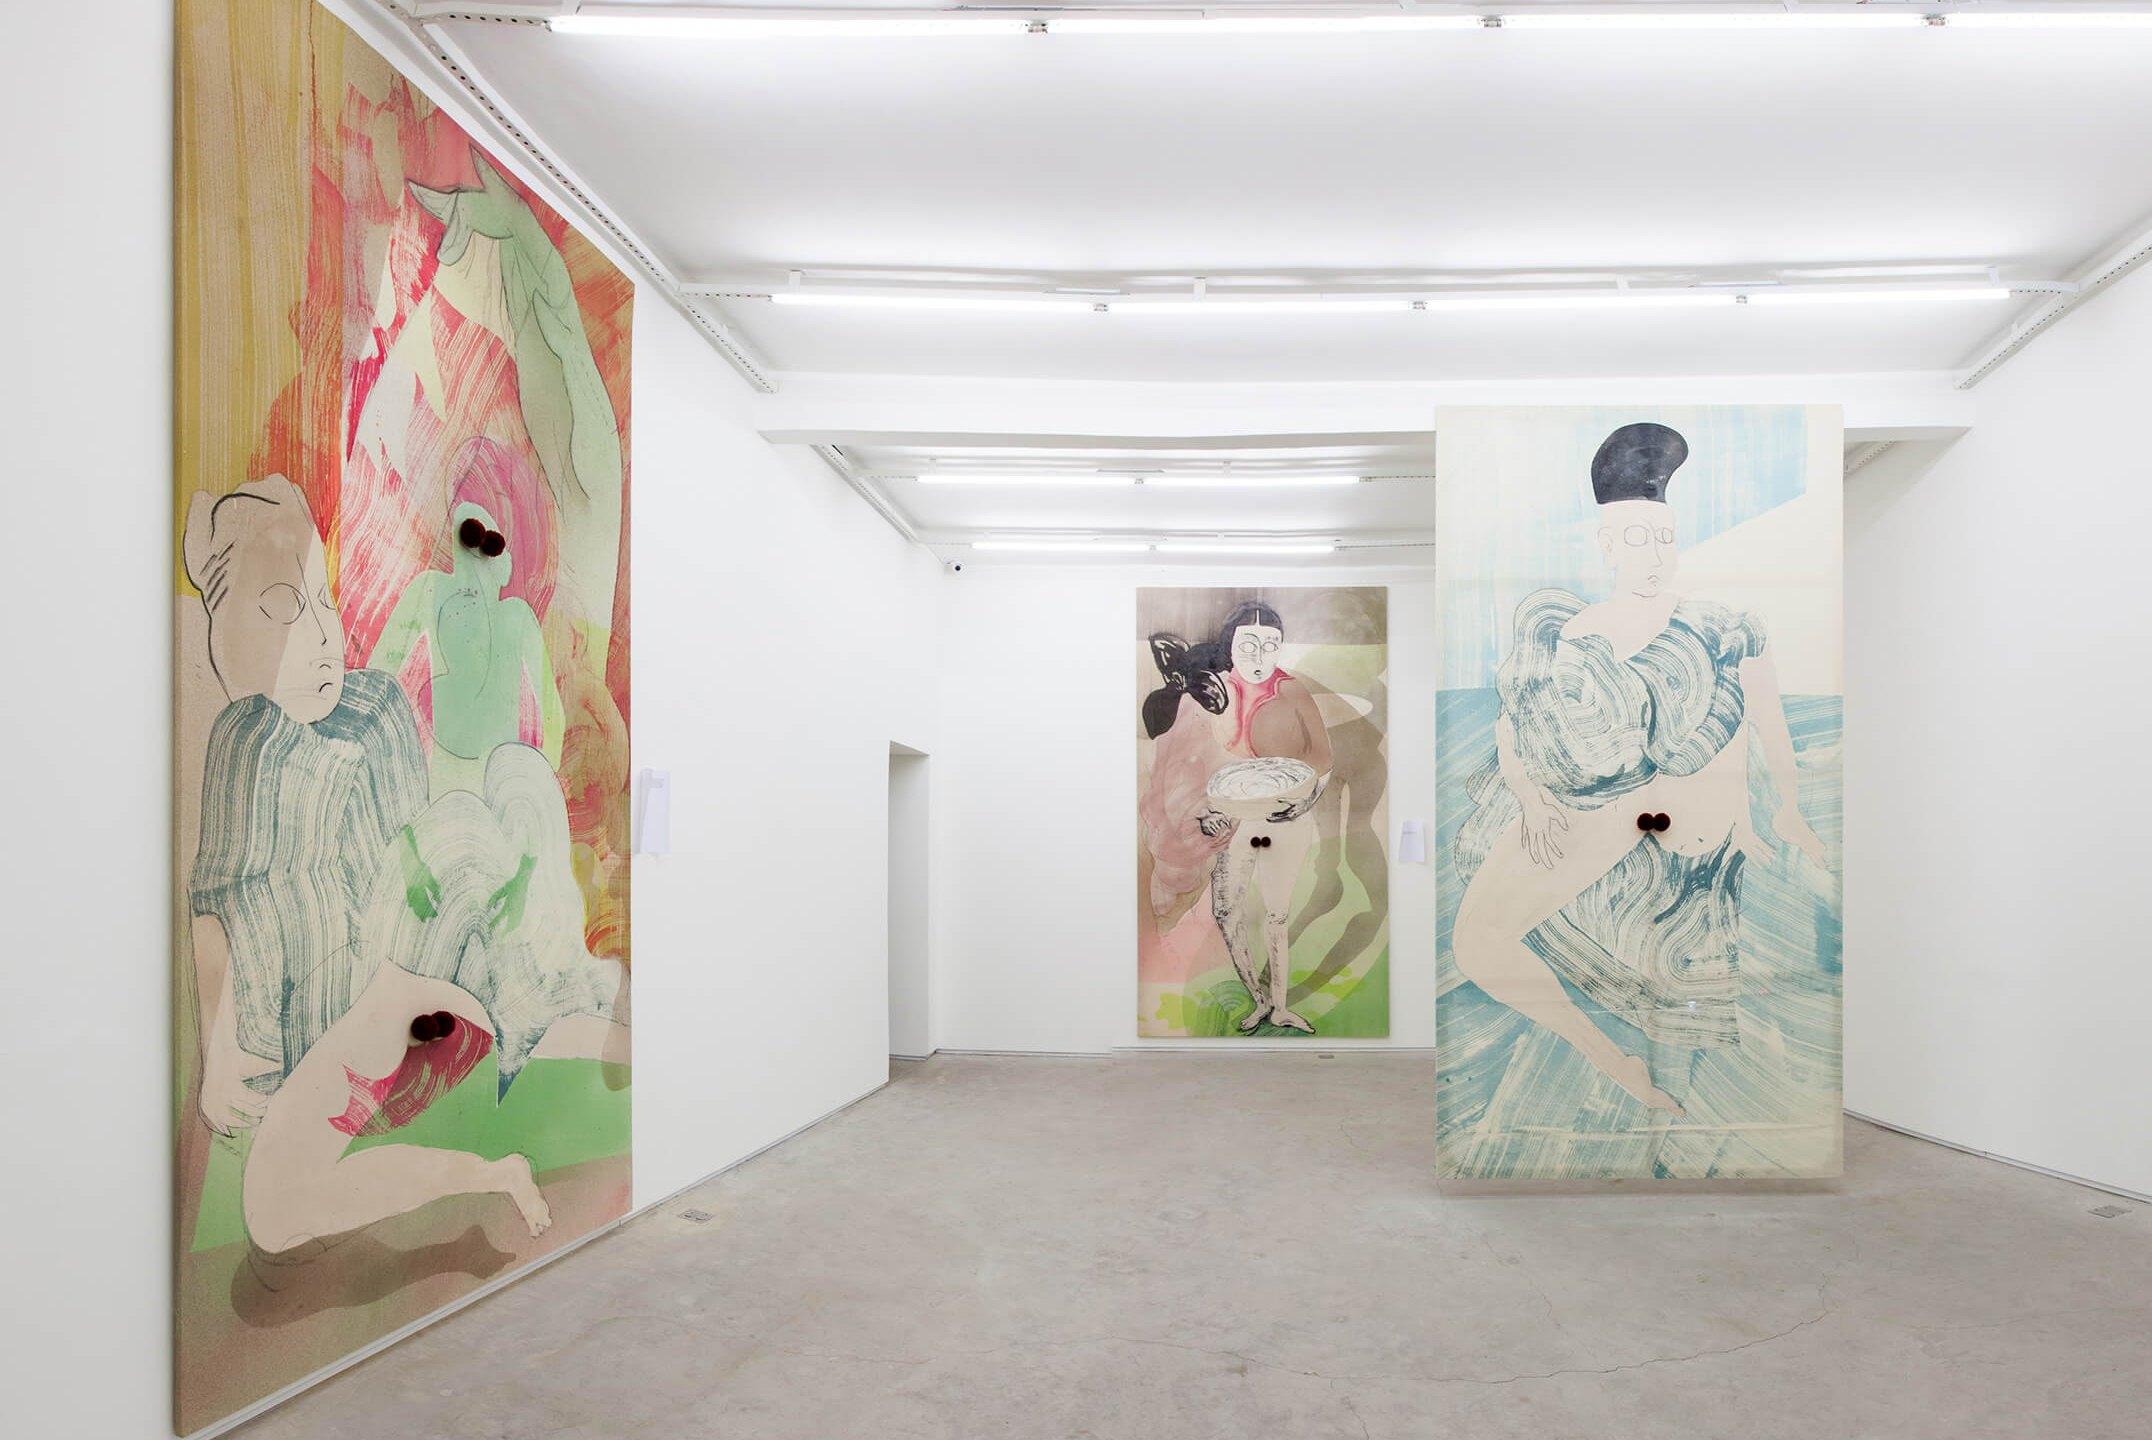 Matthew Lutz-Kinoy,<em>Princess Pompom in The Villa of Flowers,</em>Mendes Wood DM, São Paulo, 2015 - Mendes Wood DM